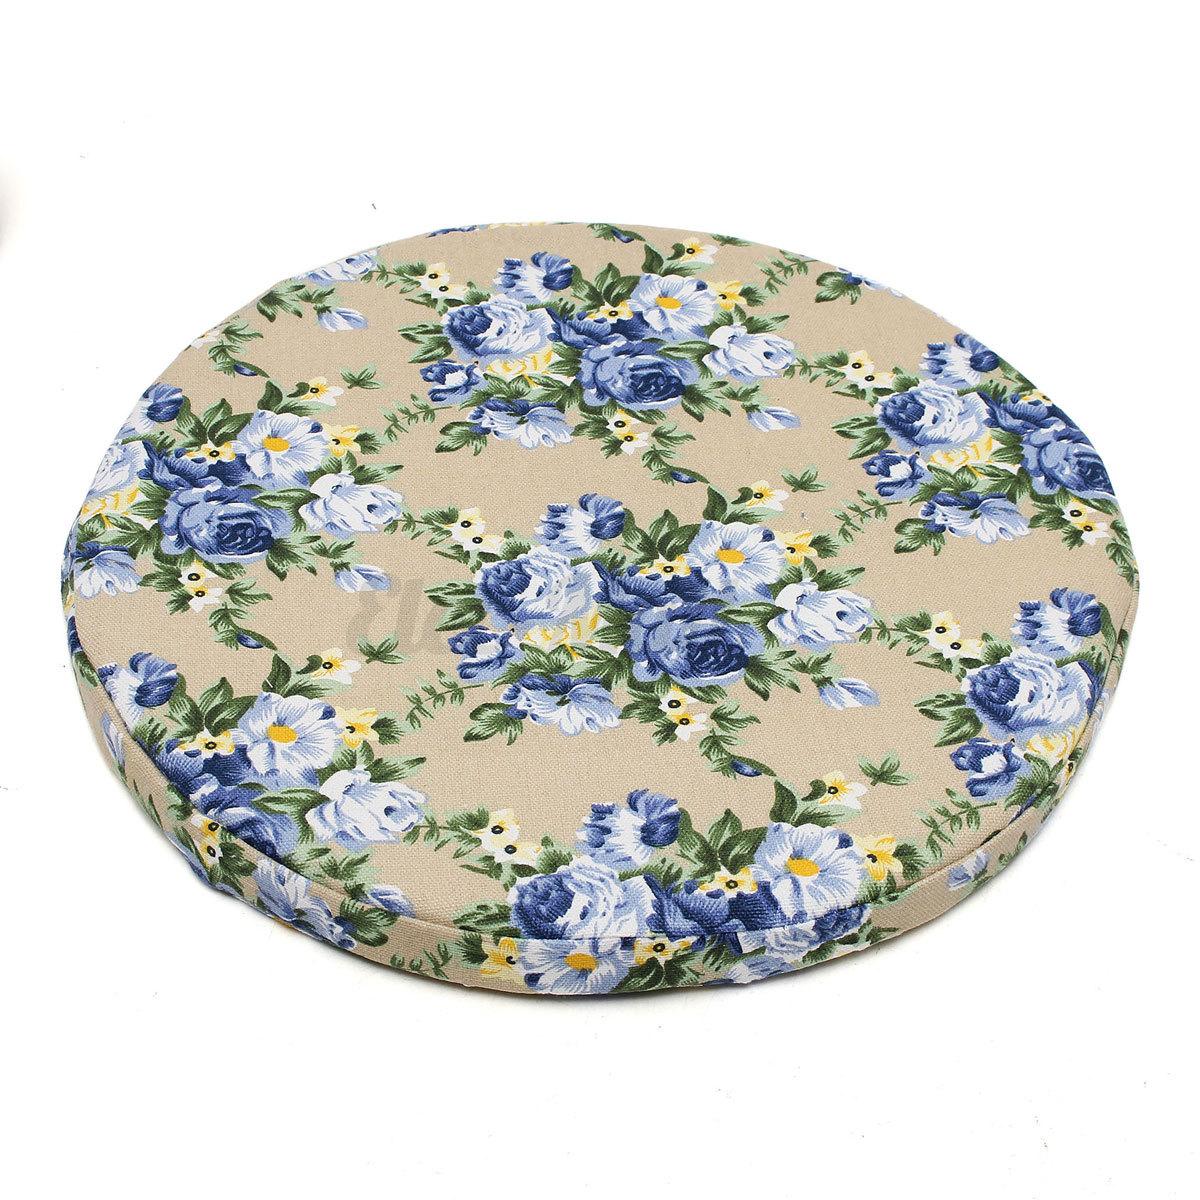 round bistro tie on kitchen dining patio seat pad mat. Black Bedroom Furniture Sets. Home Design Ideas